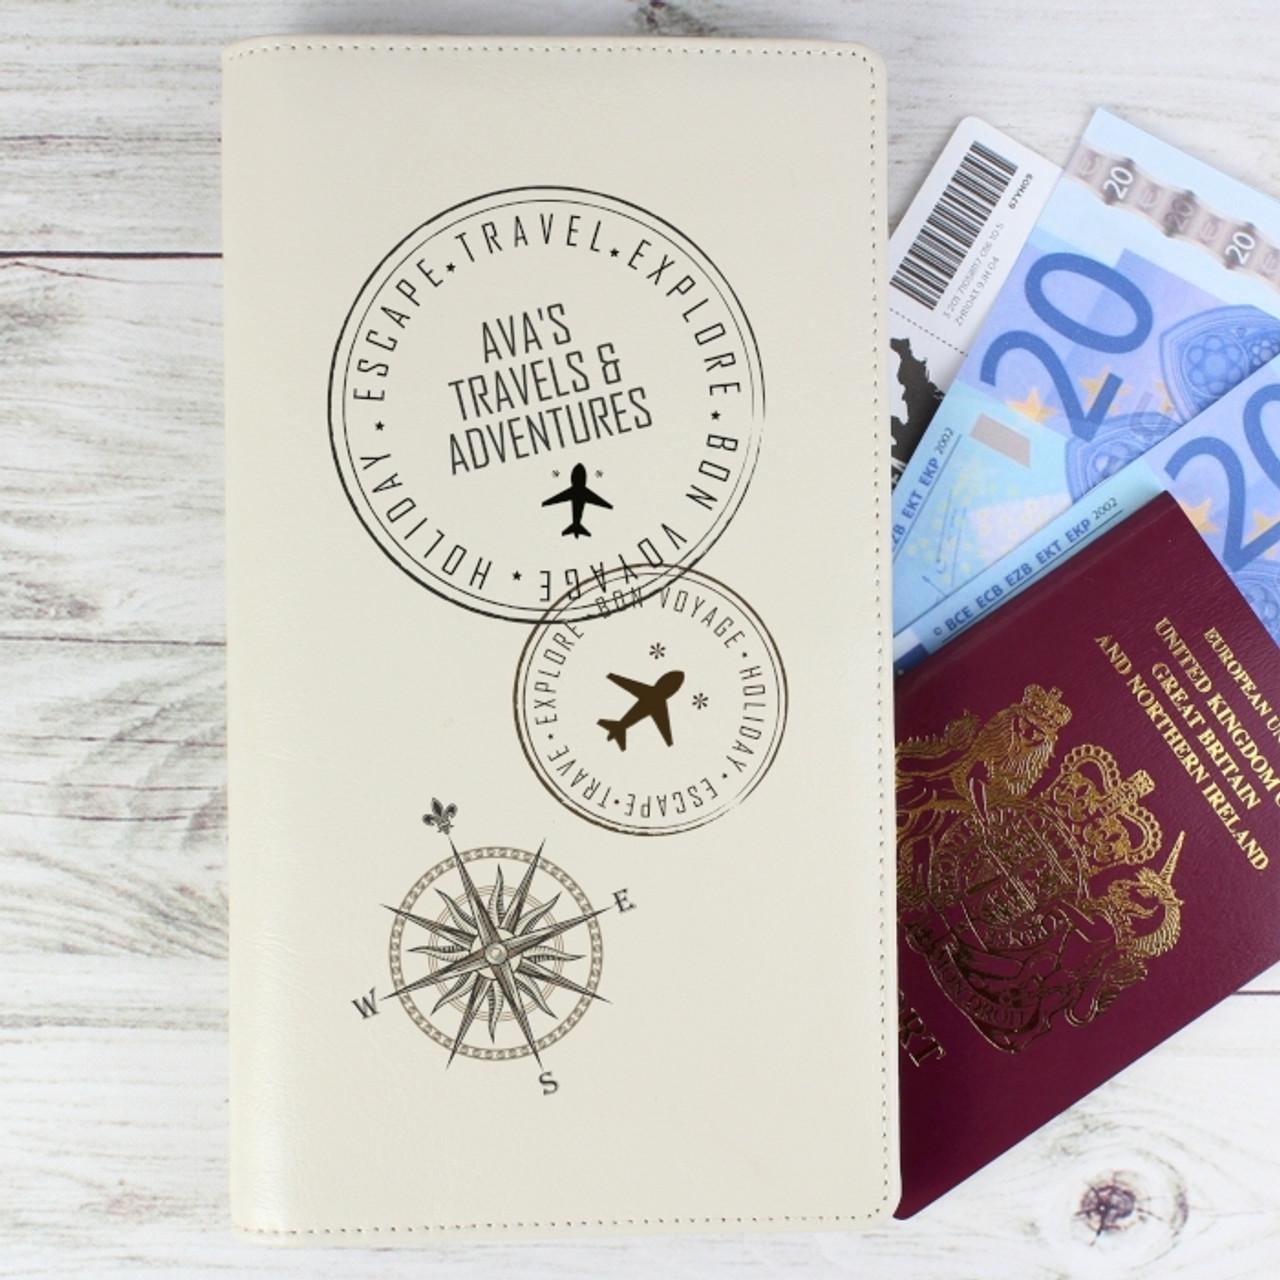 Passport & Document Holders